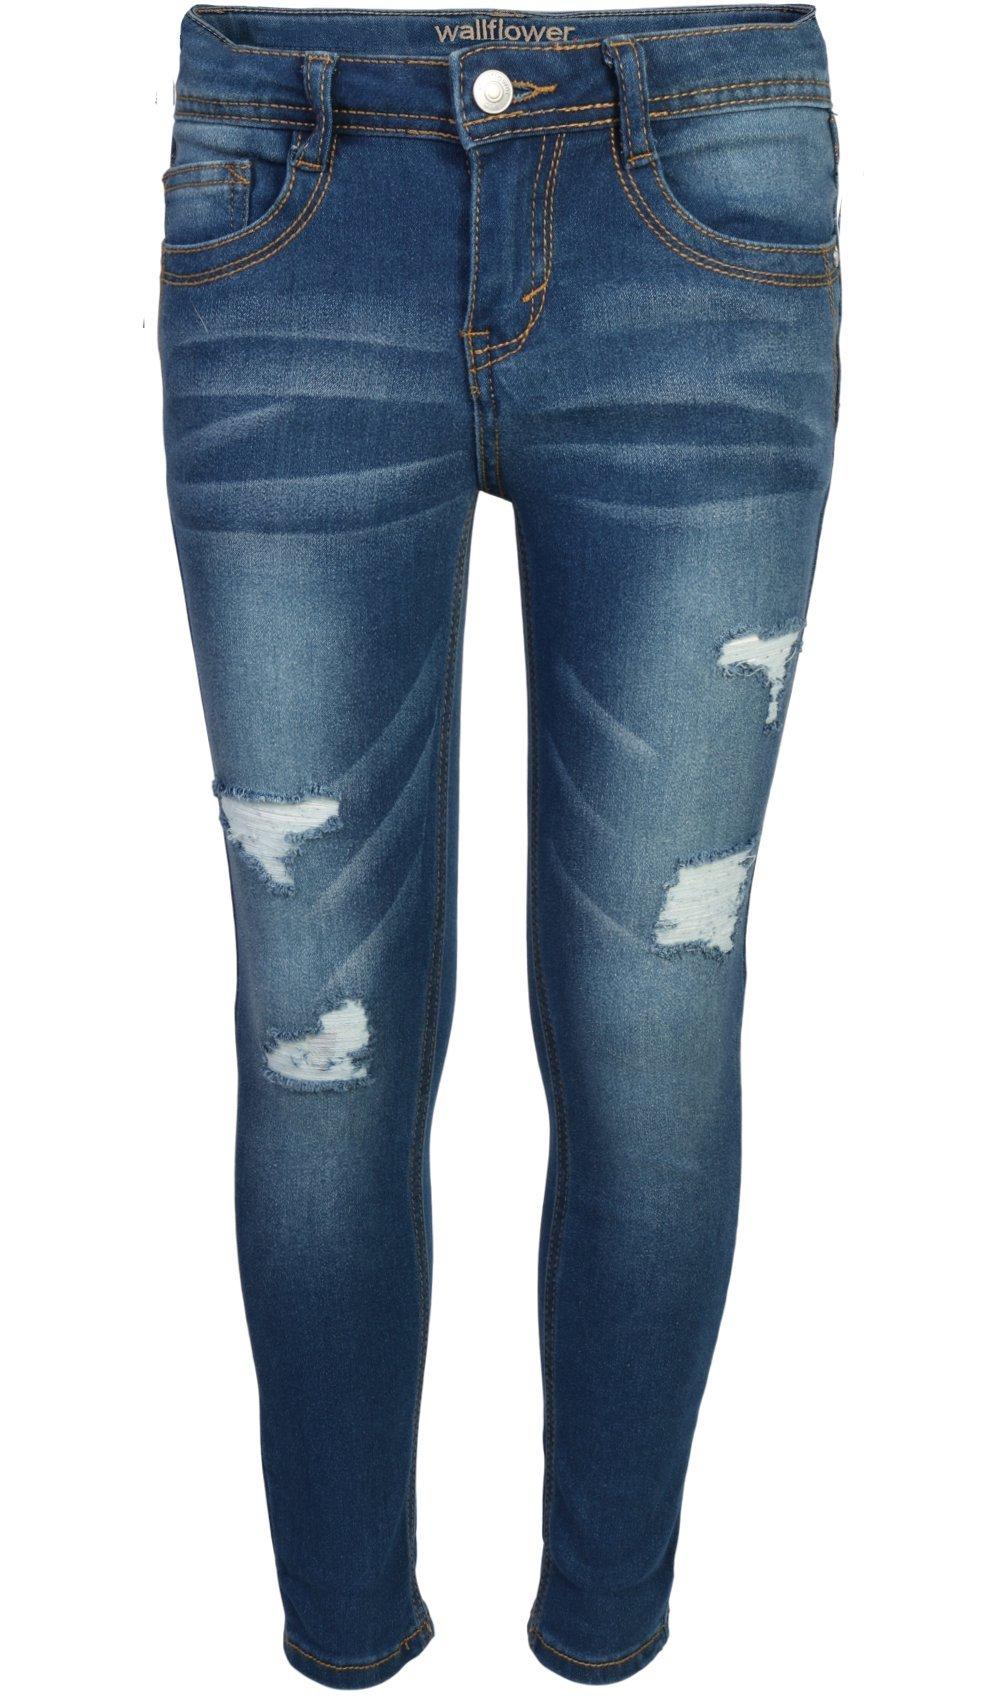 WallFlower Girl's Skinny Soft Strech Jeans, Dark Wash w/Rips, Size 8